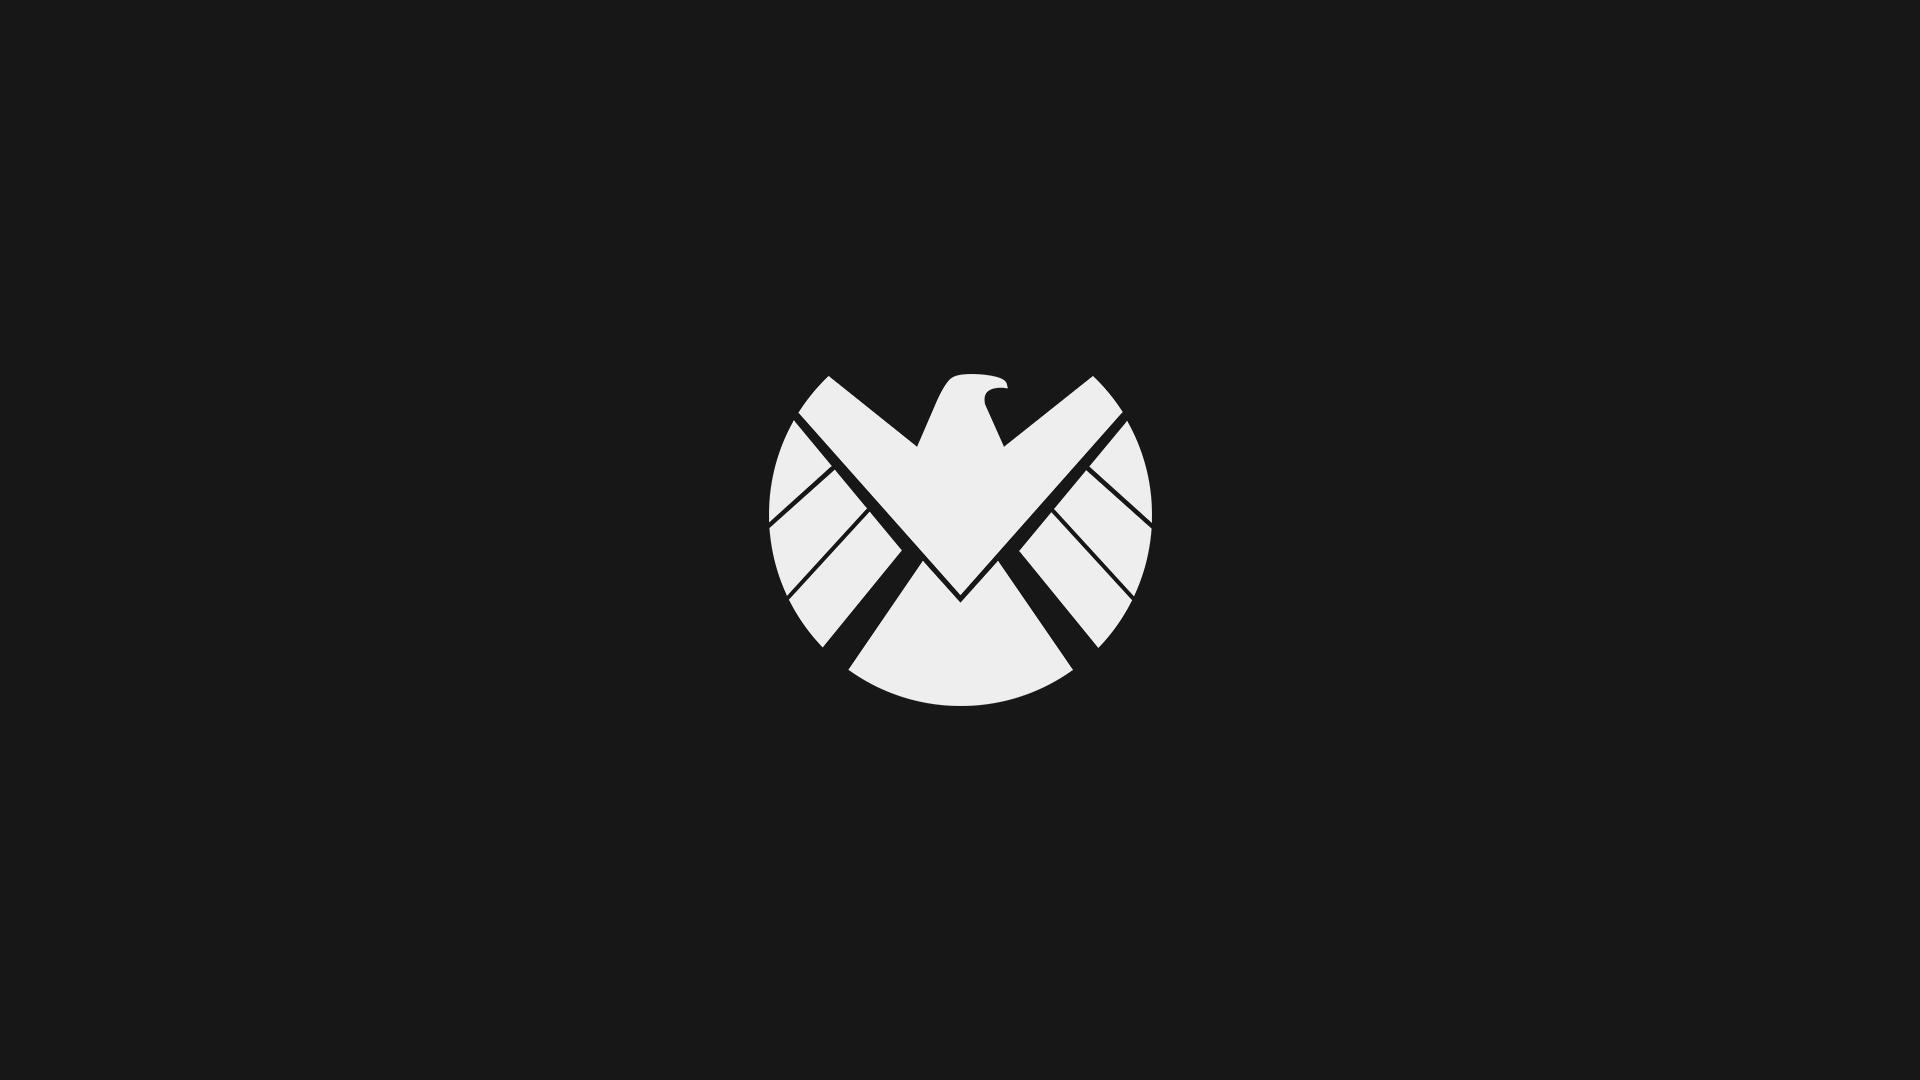 2048x1152 agents of shield logo 2048x1152 resolution hd 4k